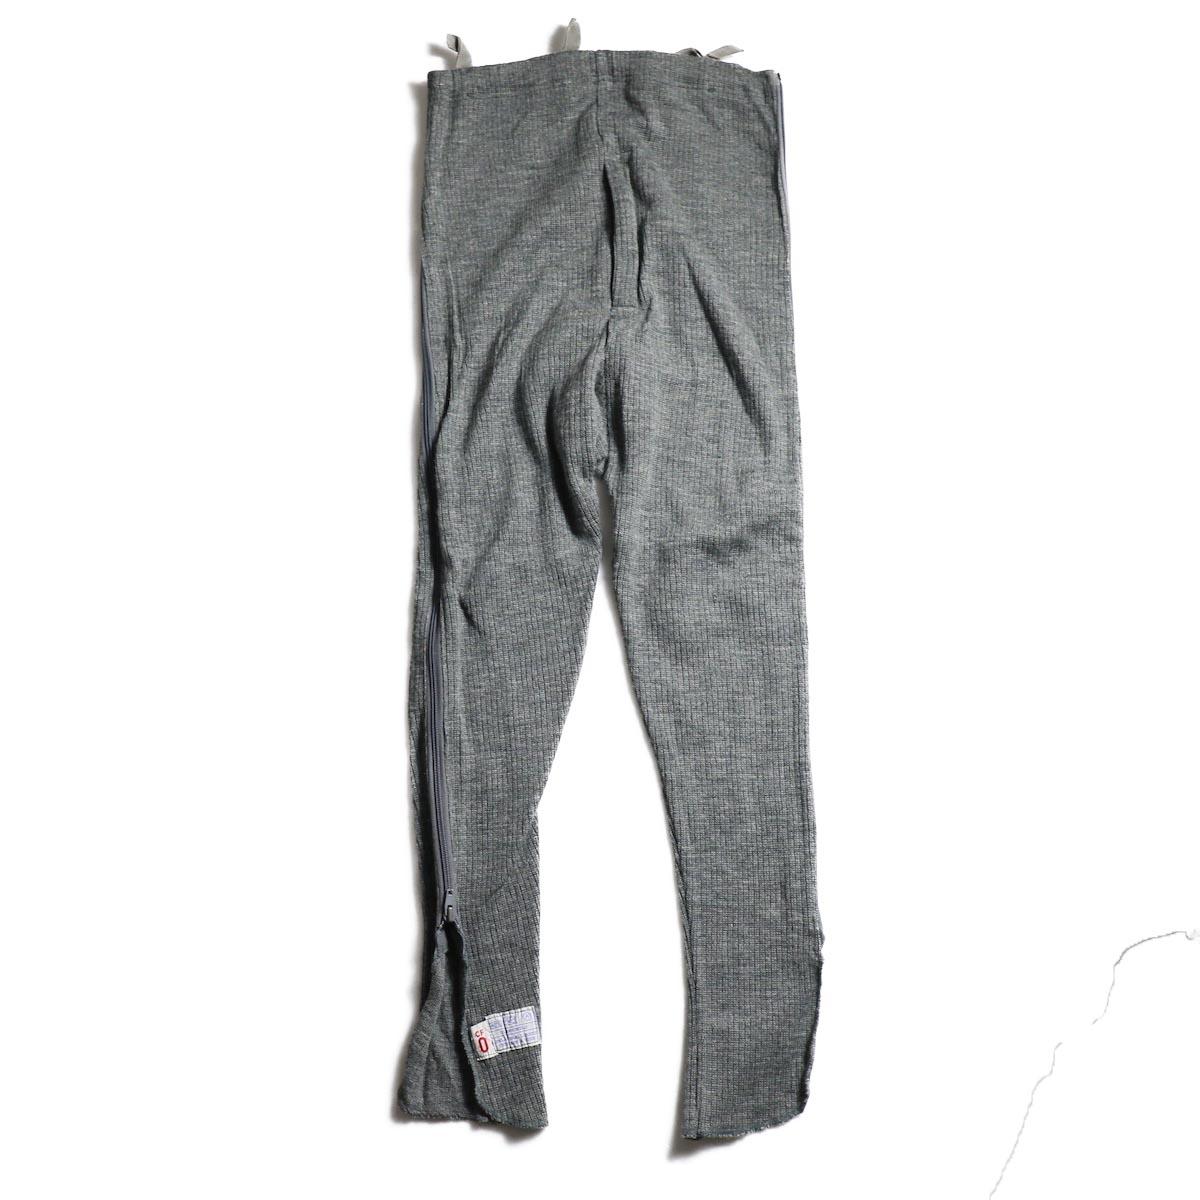 Denmark Military / Side Zip Under Pants (Medium) (D)